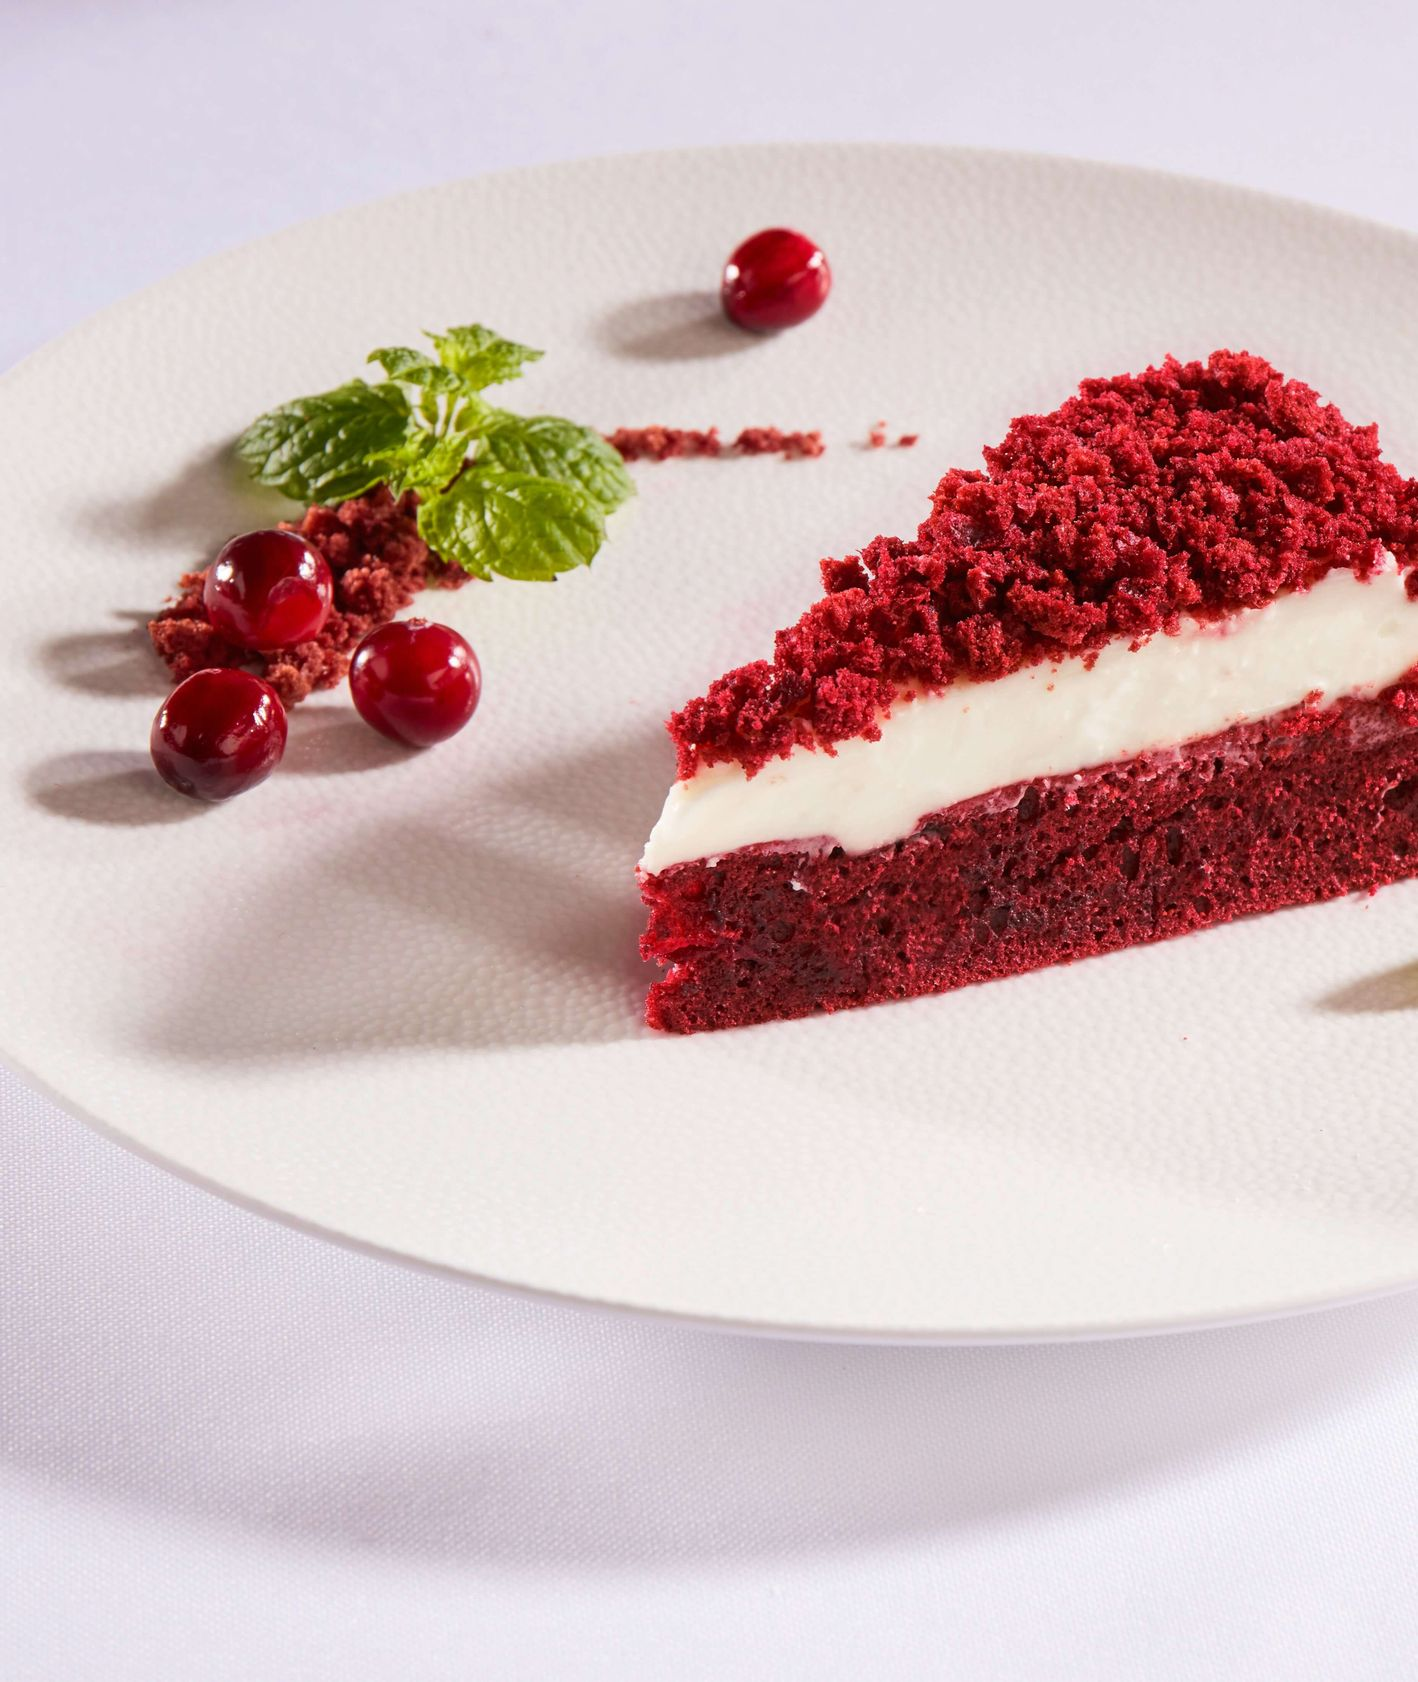 Ciasto Red Velvet z wiśniami i wiśniówką, deser, czerwone ciasto, makro